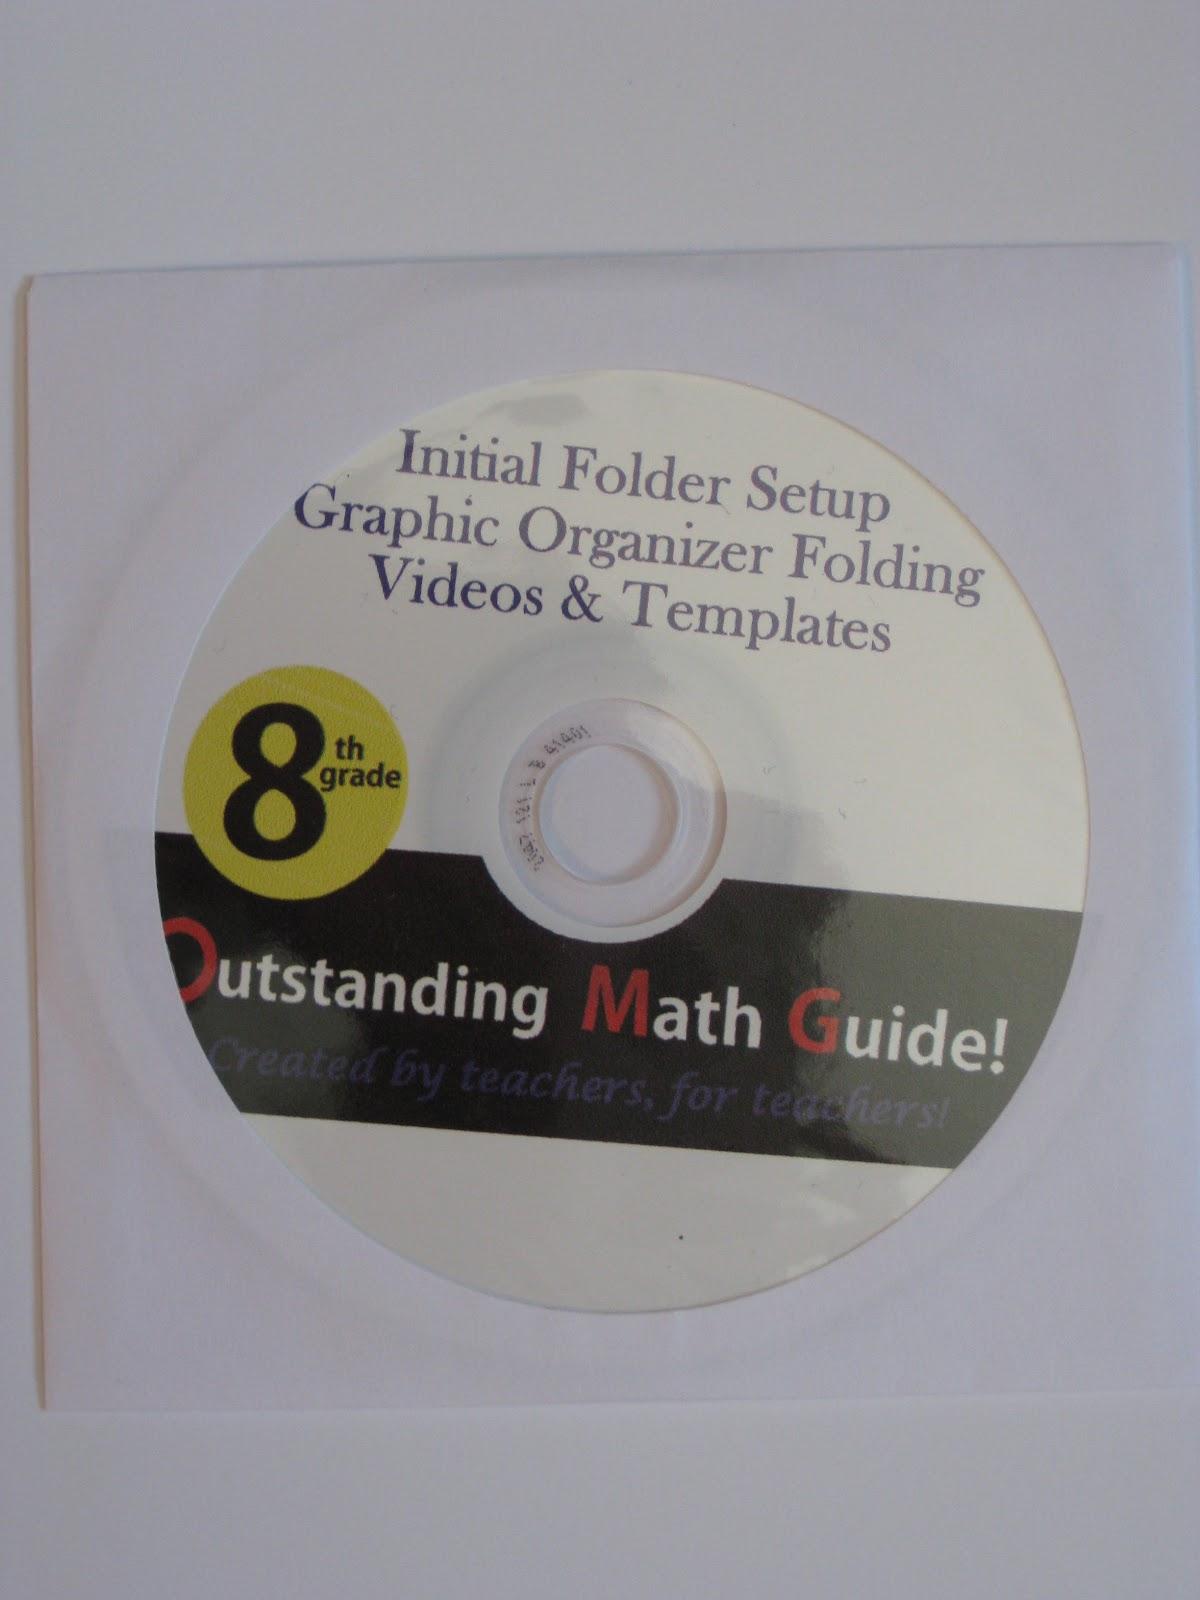 mathrm218 omg outstanding math guide rh mathrm218 blogspot com omg outstanding math guide Accuplacer Math Study Guide